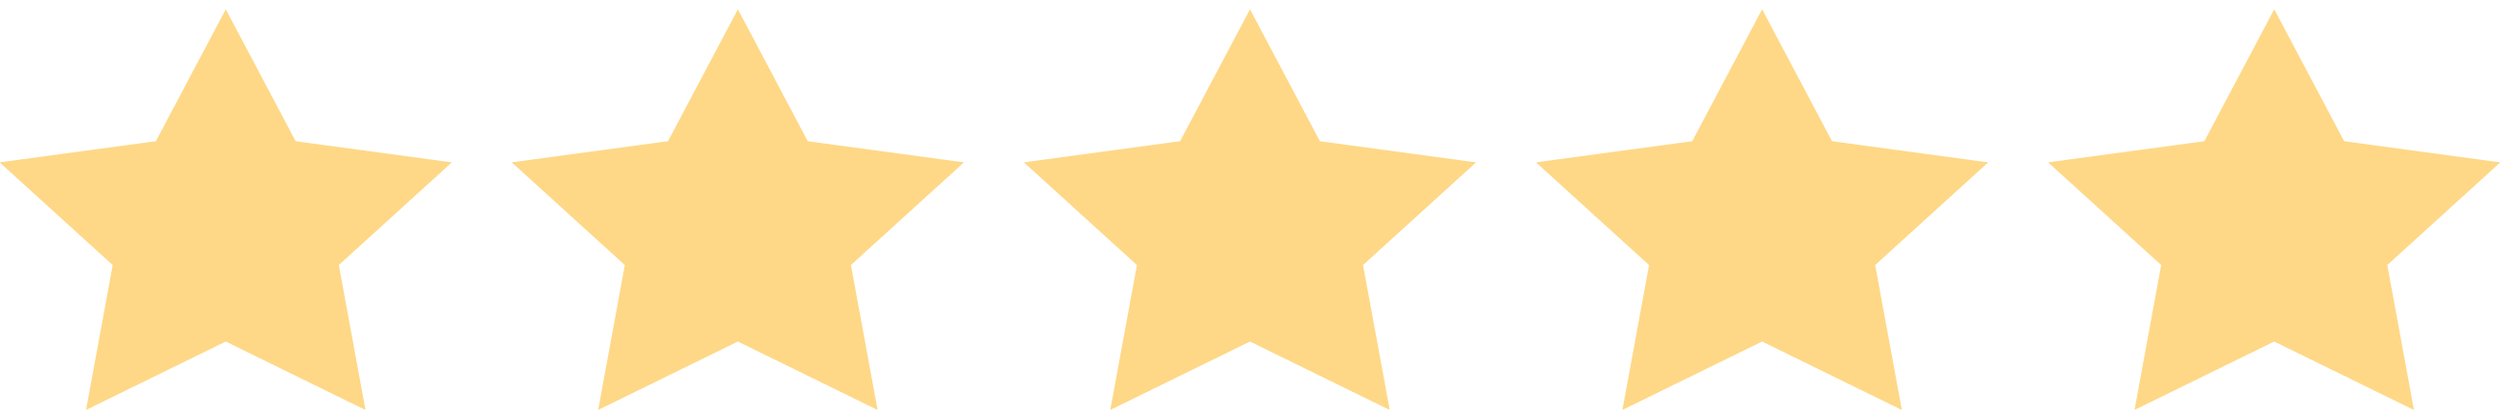 stars-05.png